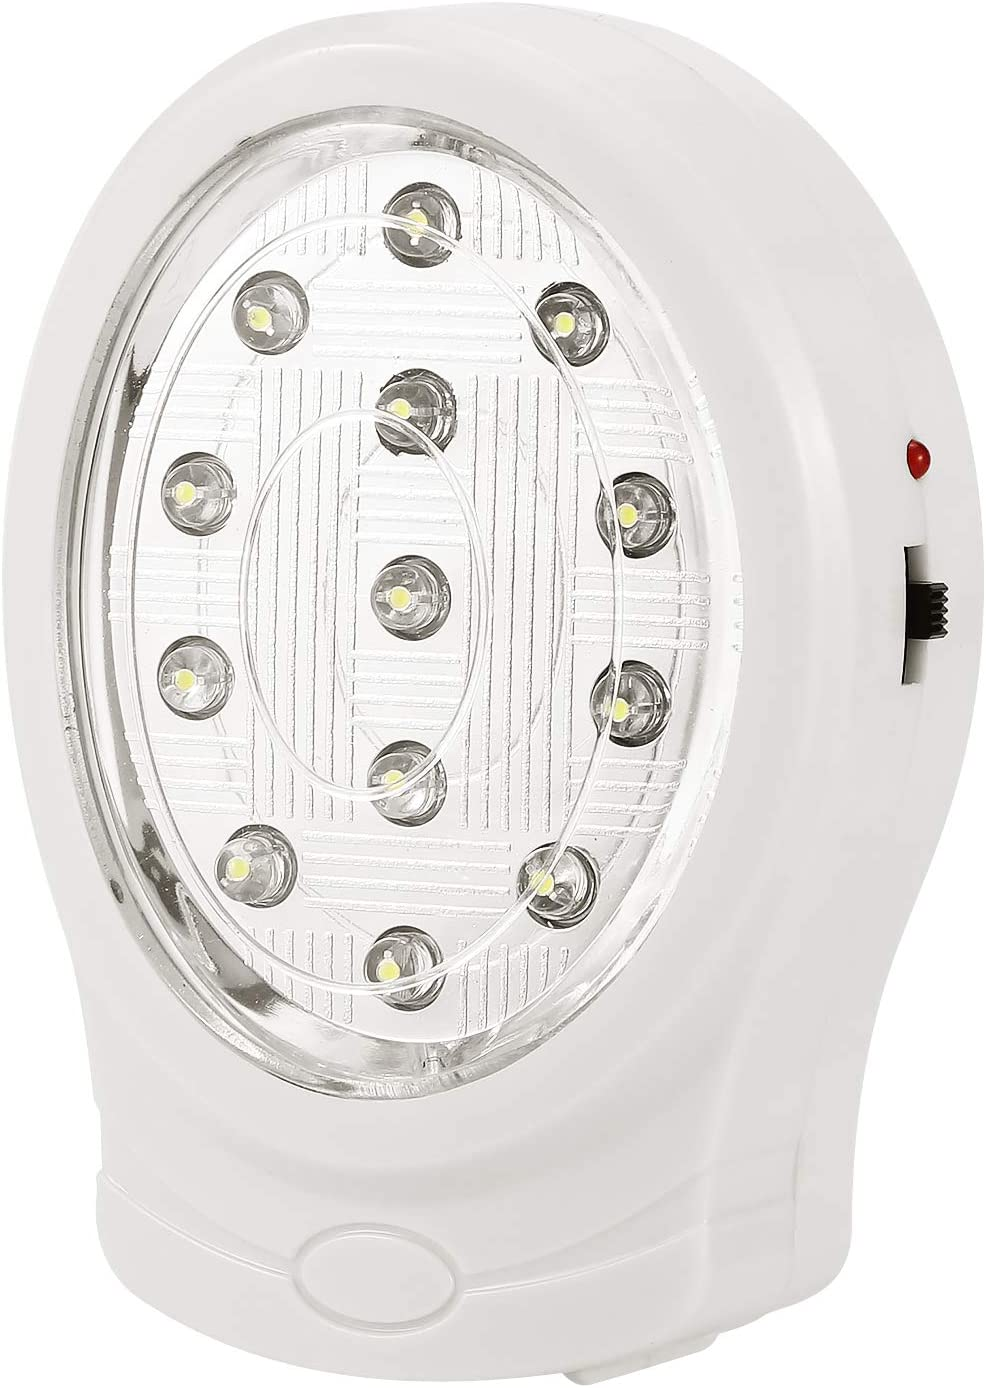 Emergency Light 13 LED Rechargeable Home Automatic Power Failure Outage Light lamp Fire Emergency Light (US Plug)